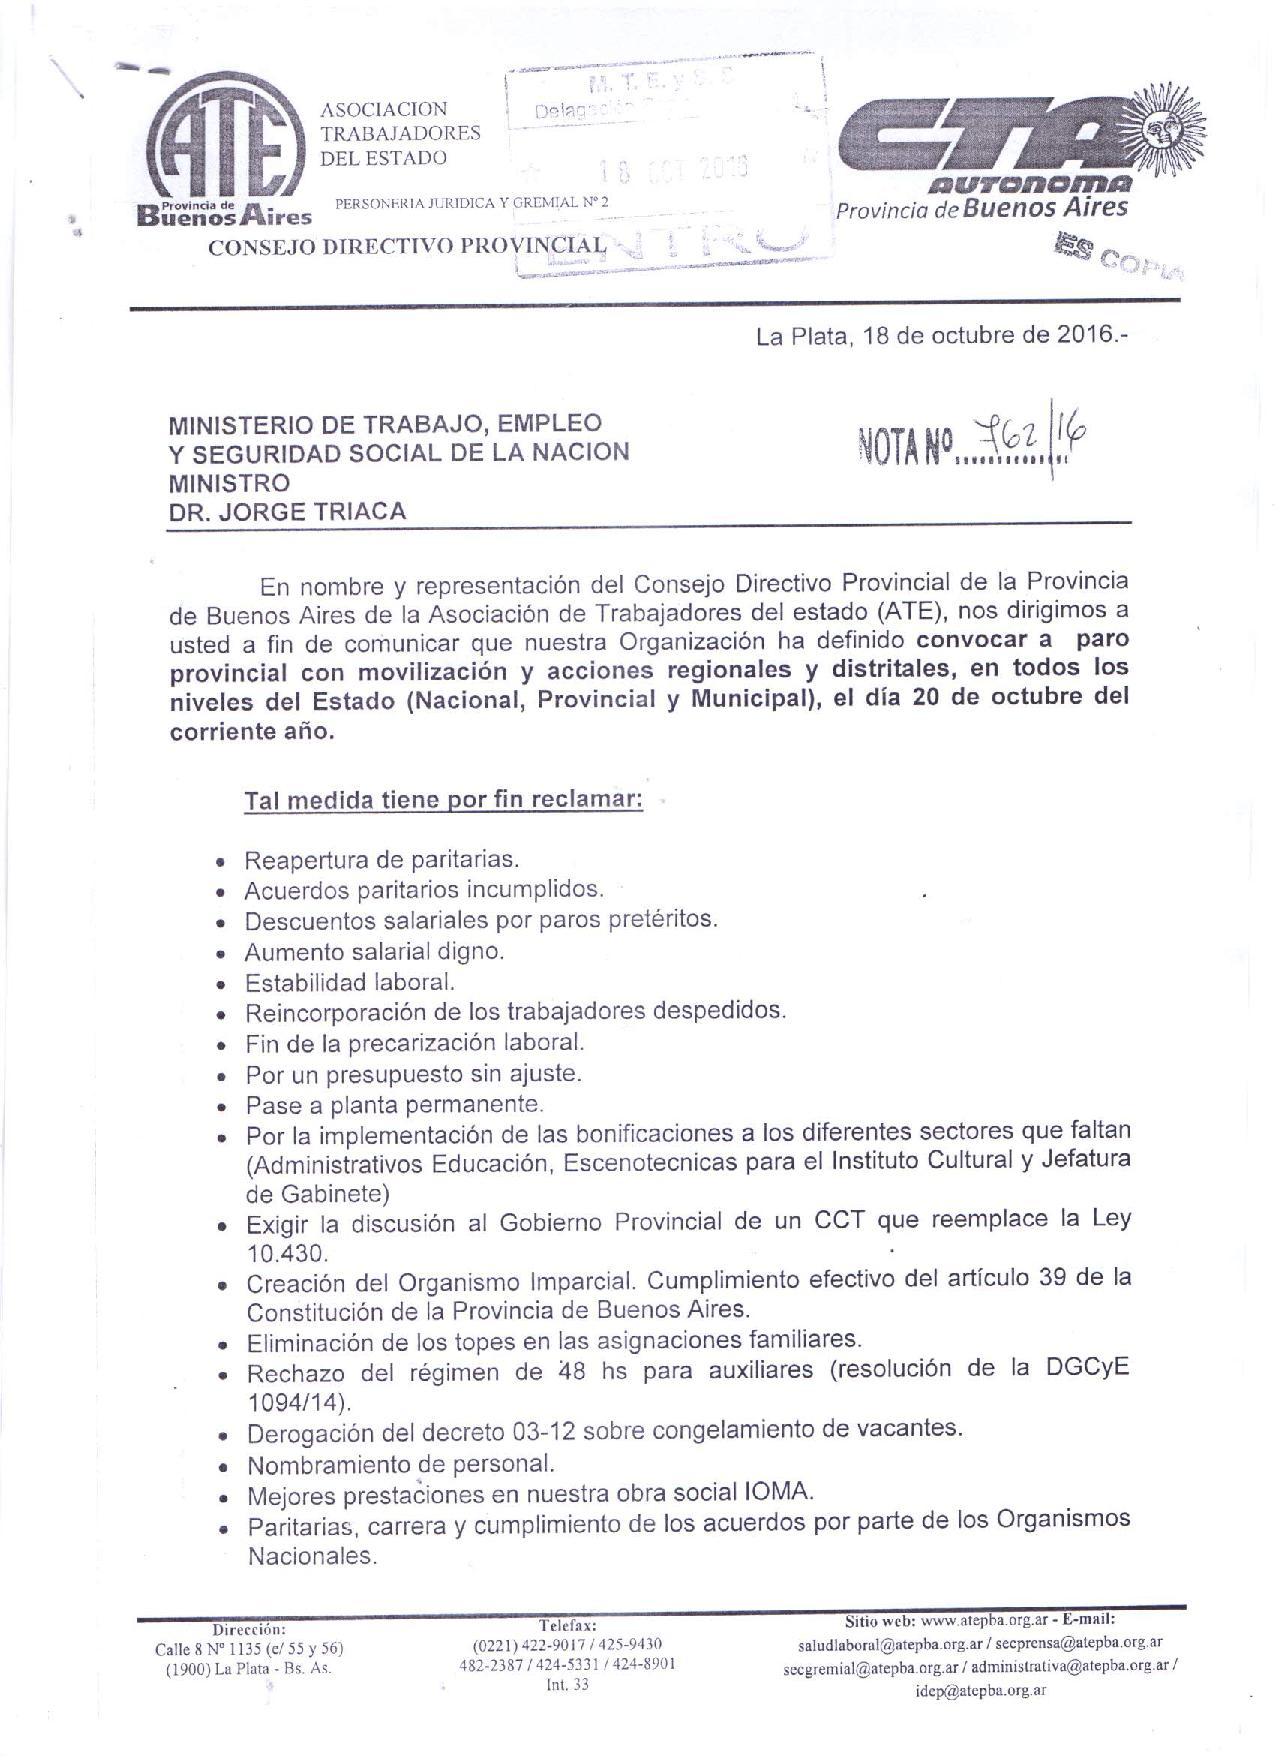 295-1-nota-de-paro-page-001